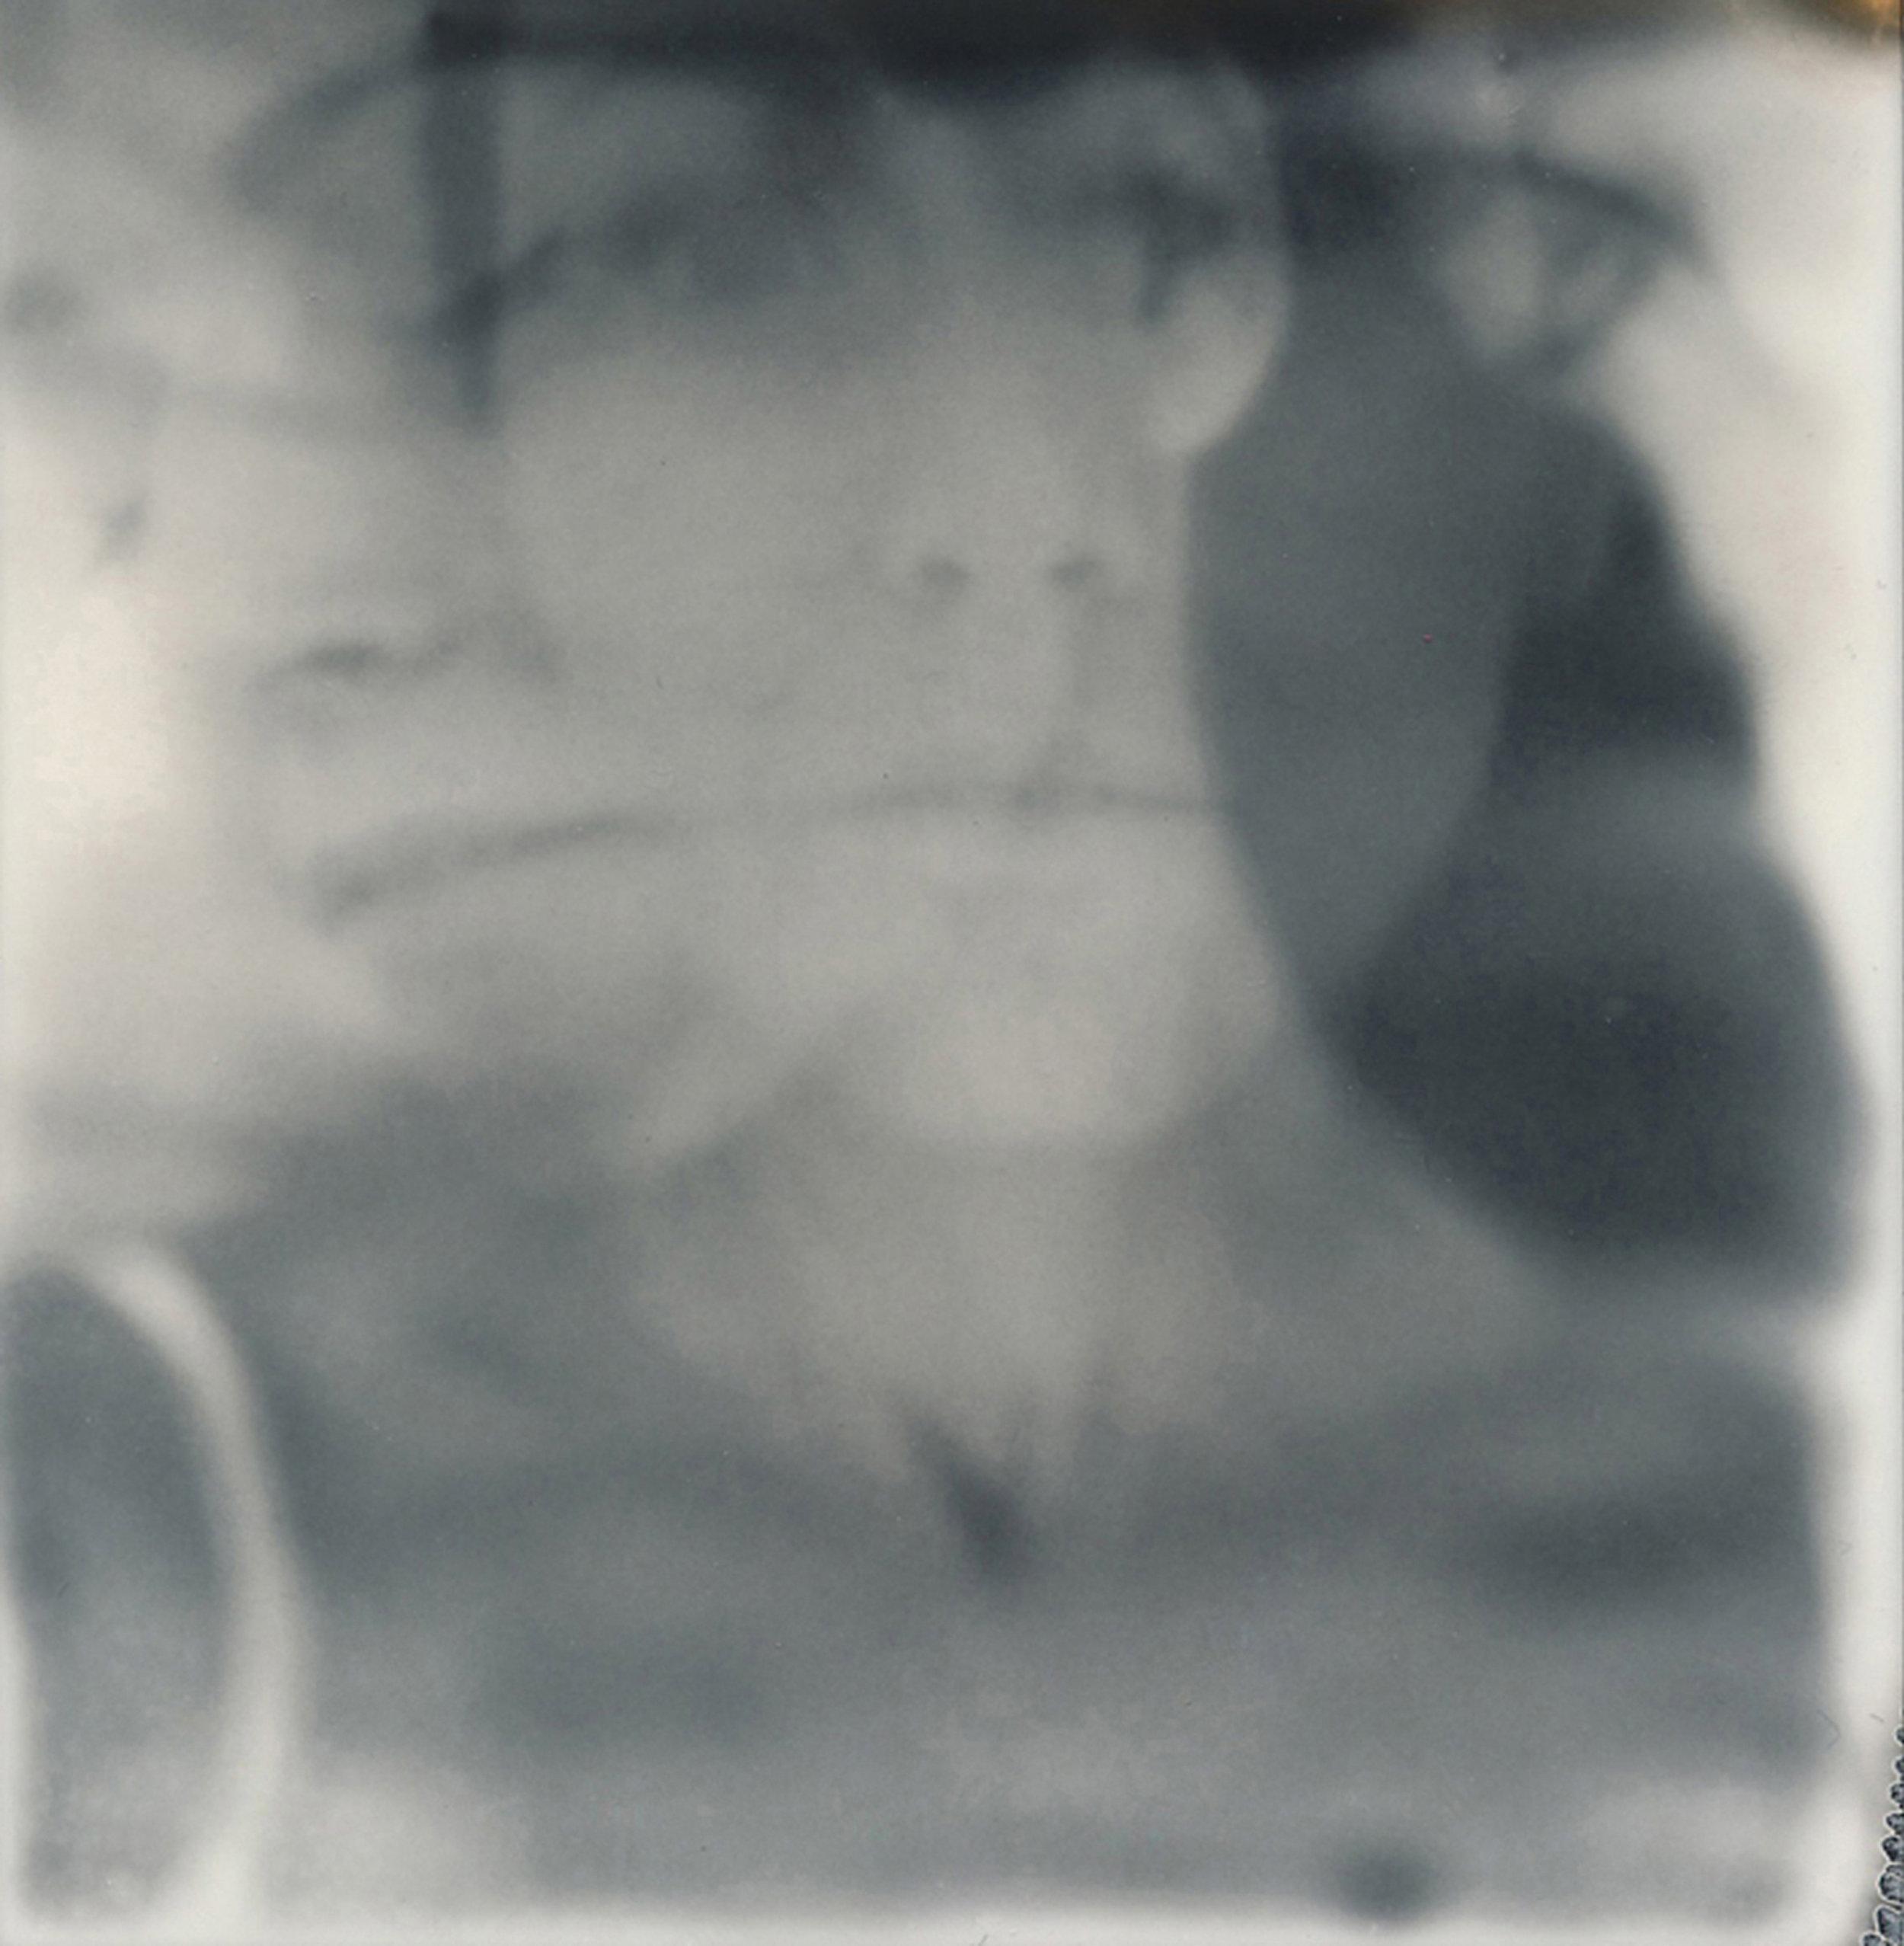 Catherine_Just_Self Portrait_NYC_Oct 2015_the white slip.jpg